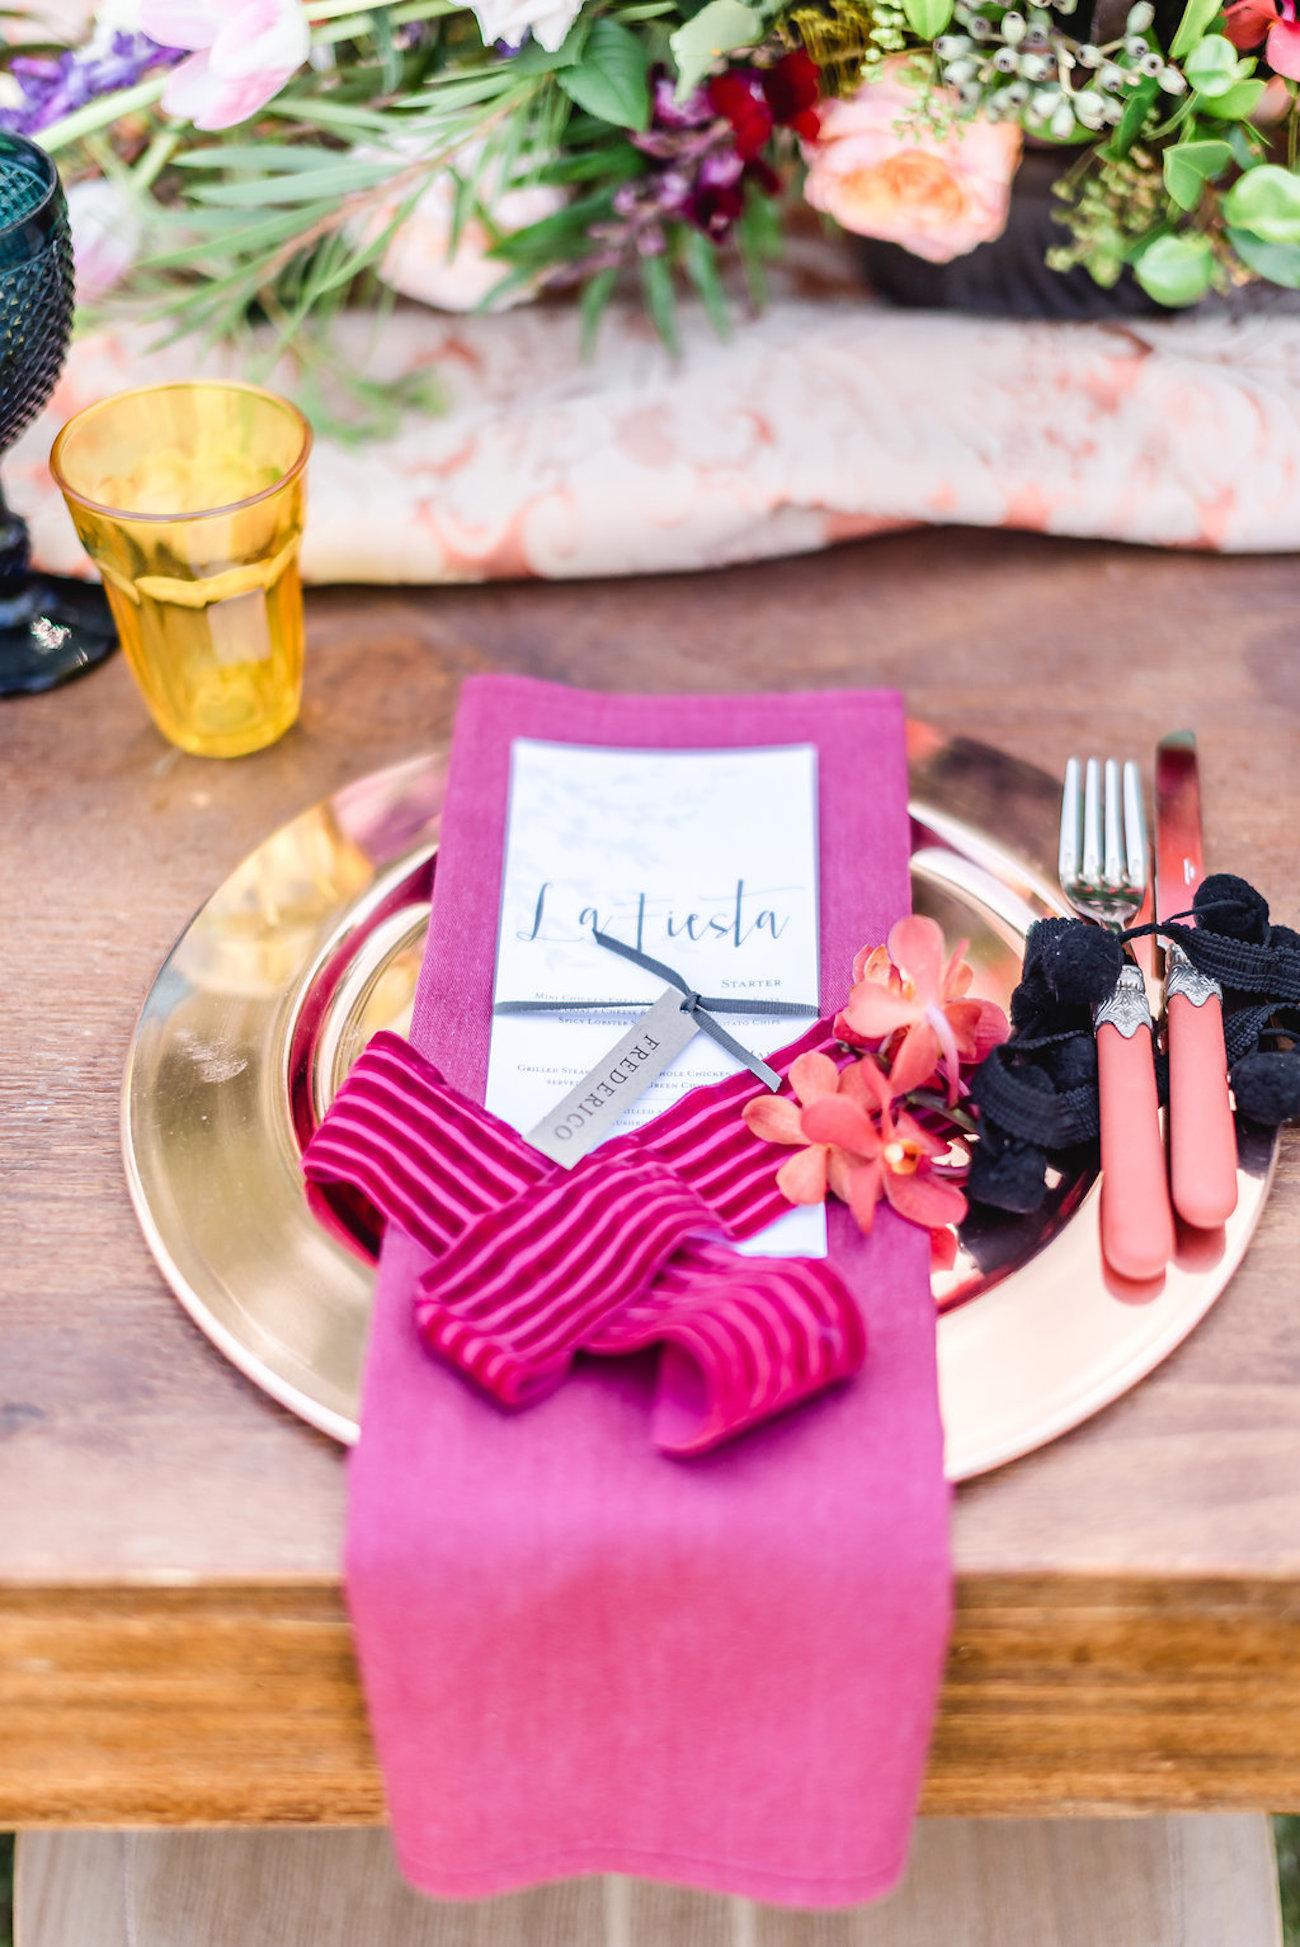 Colorful Place Setting Fuschia | Credit: Jacoba Clothing/PhotoKru